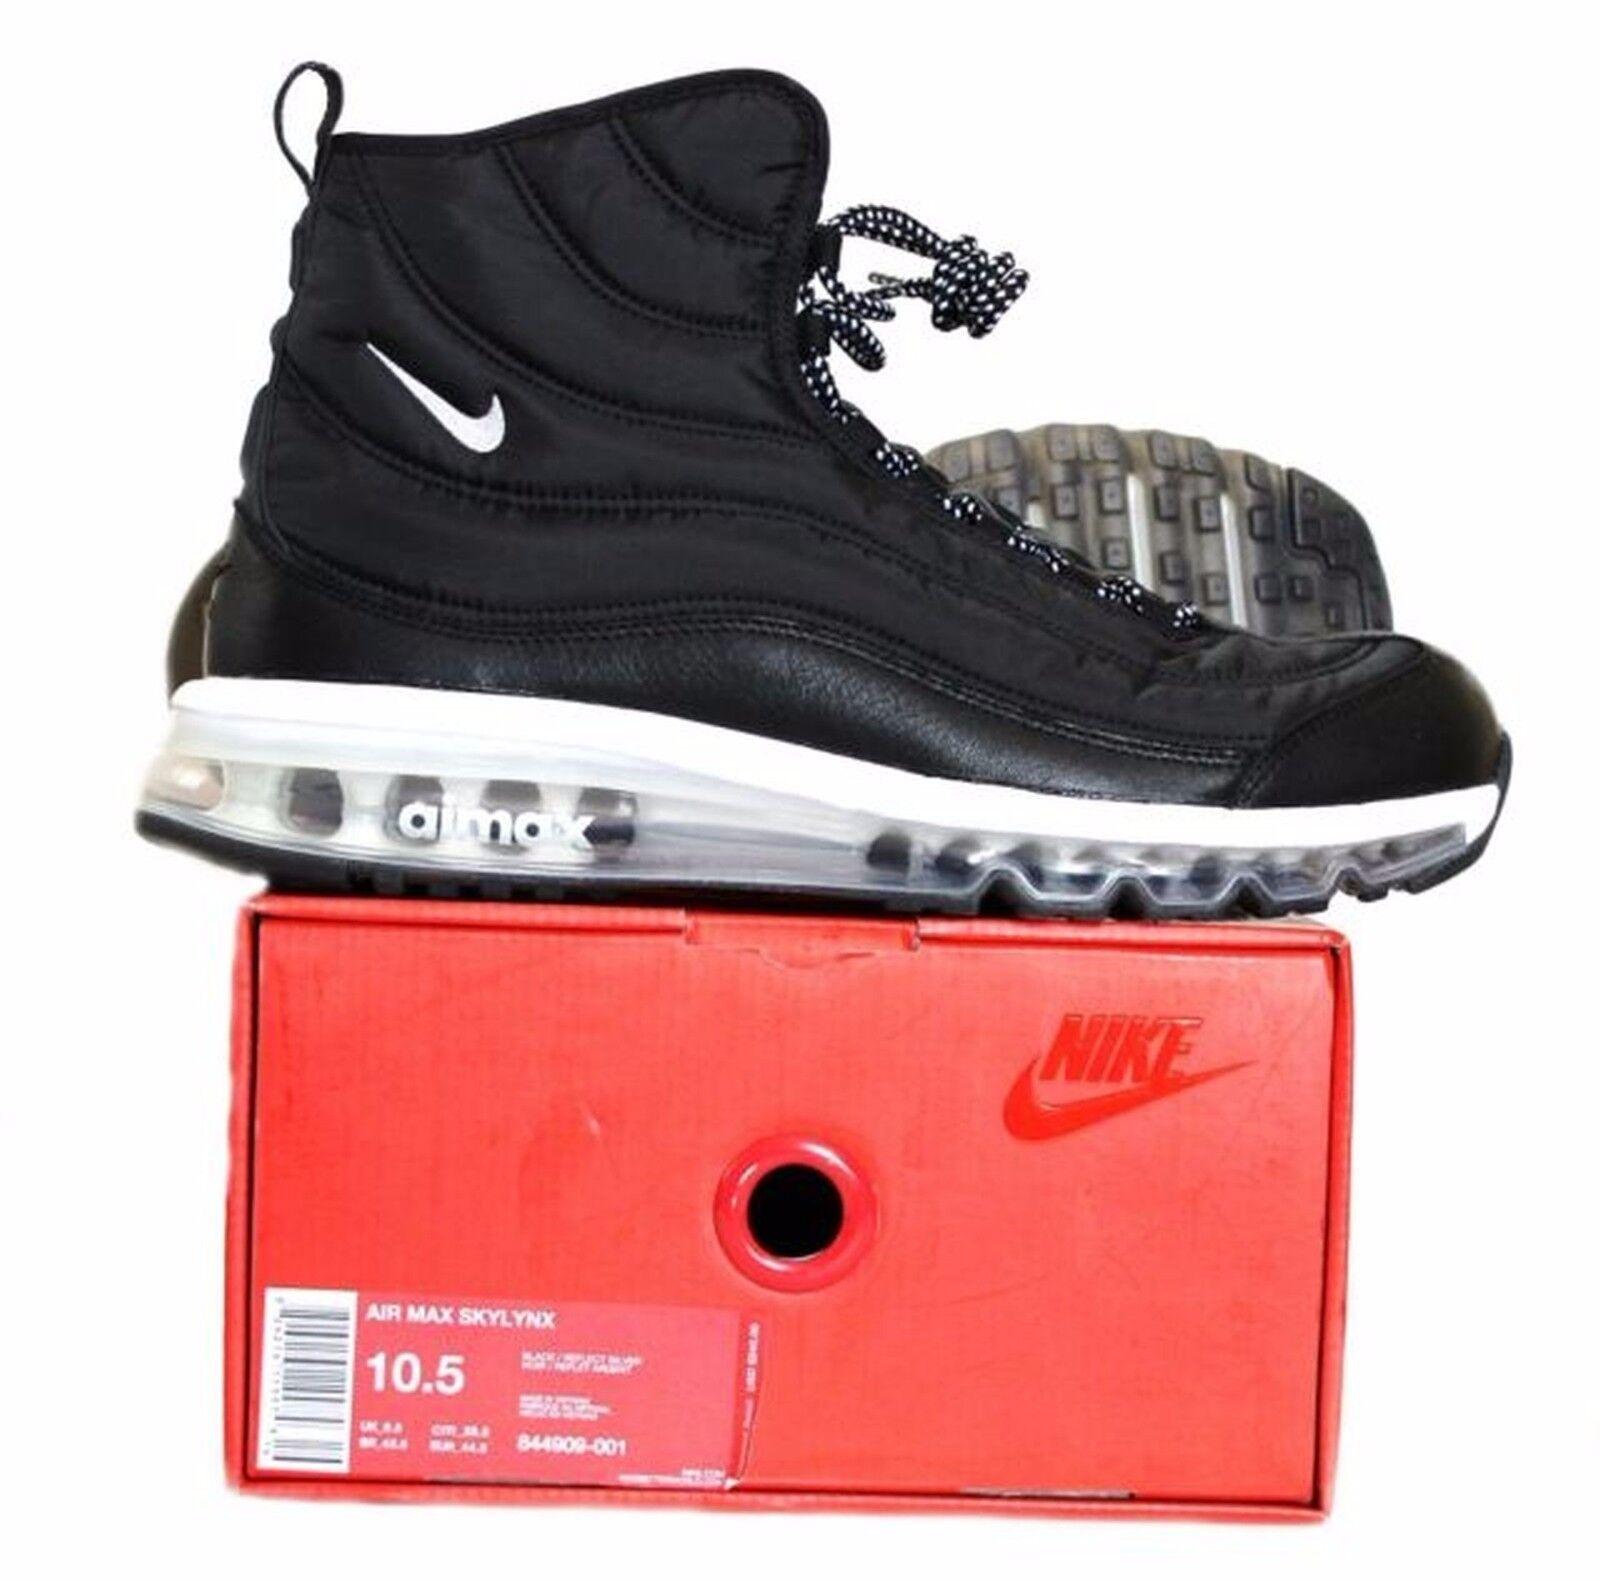 Nike max air max Nike skylynx schwarz / silber mens  9,5 844909-001 widerspiegeln den 240 ac67b2